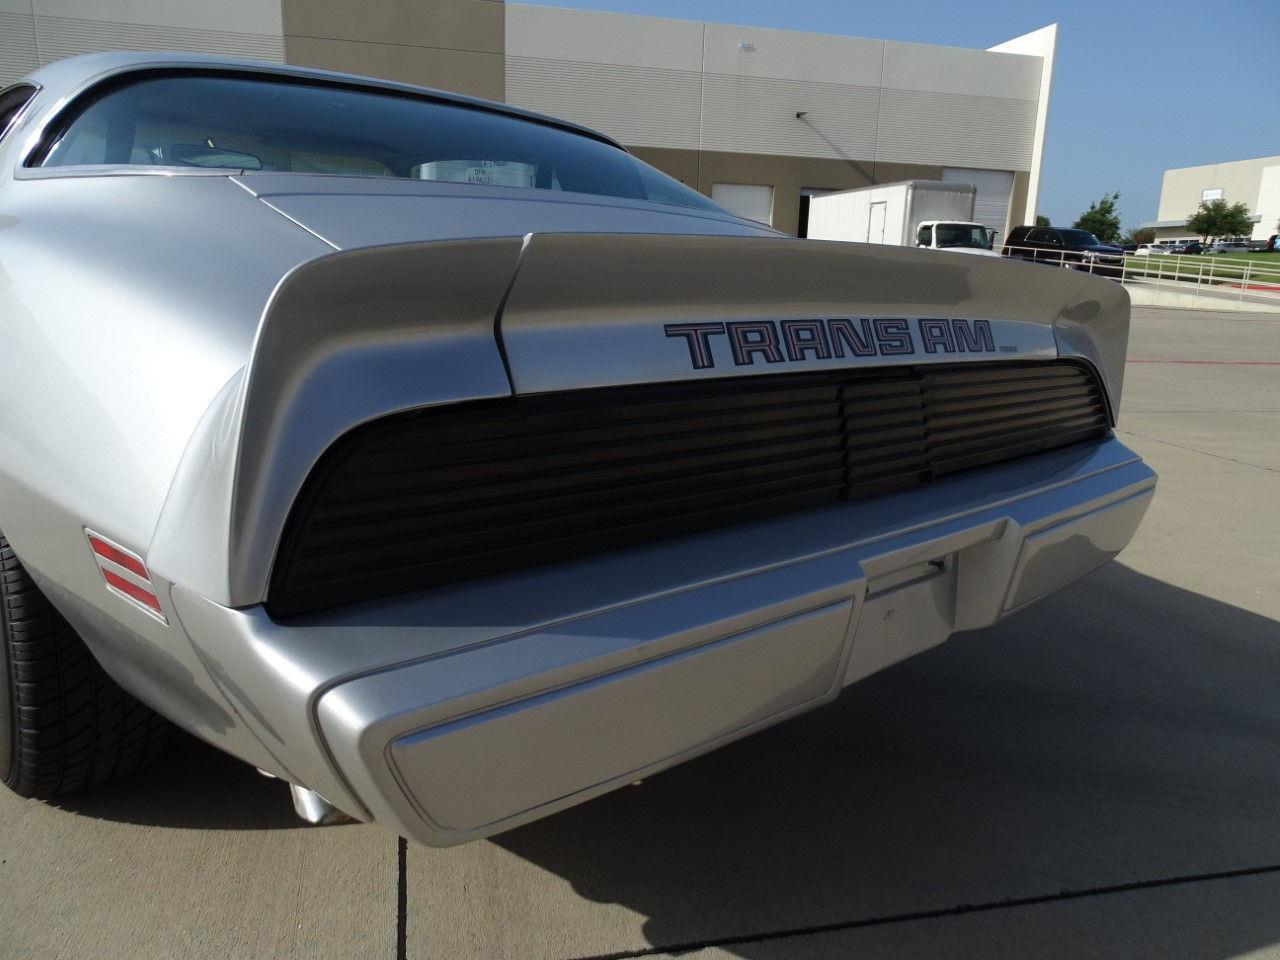 1979 Pontiac Firebird Trans Am (CC-1419945) for sale in O'Fallon, Illinois